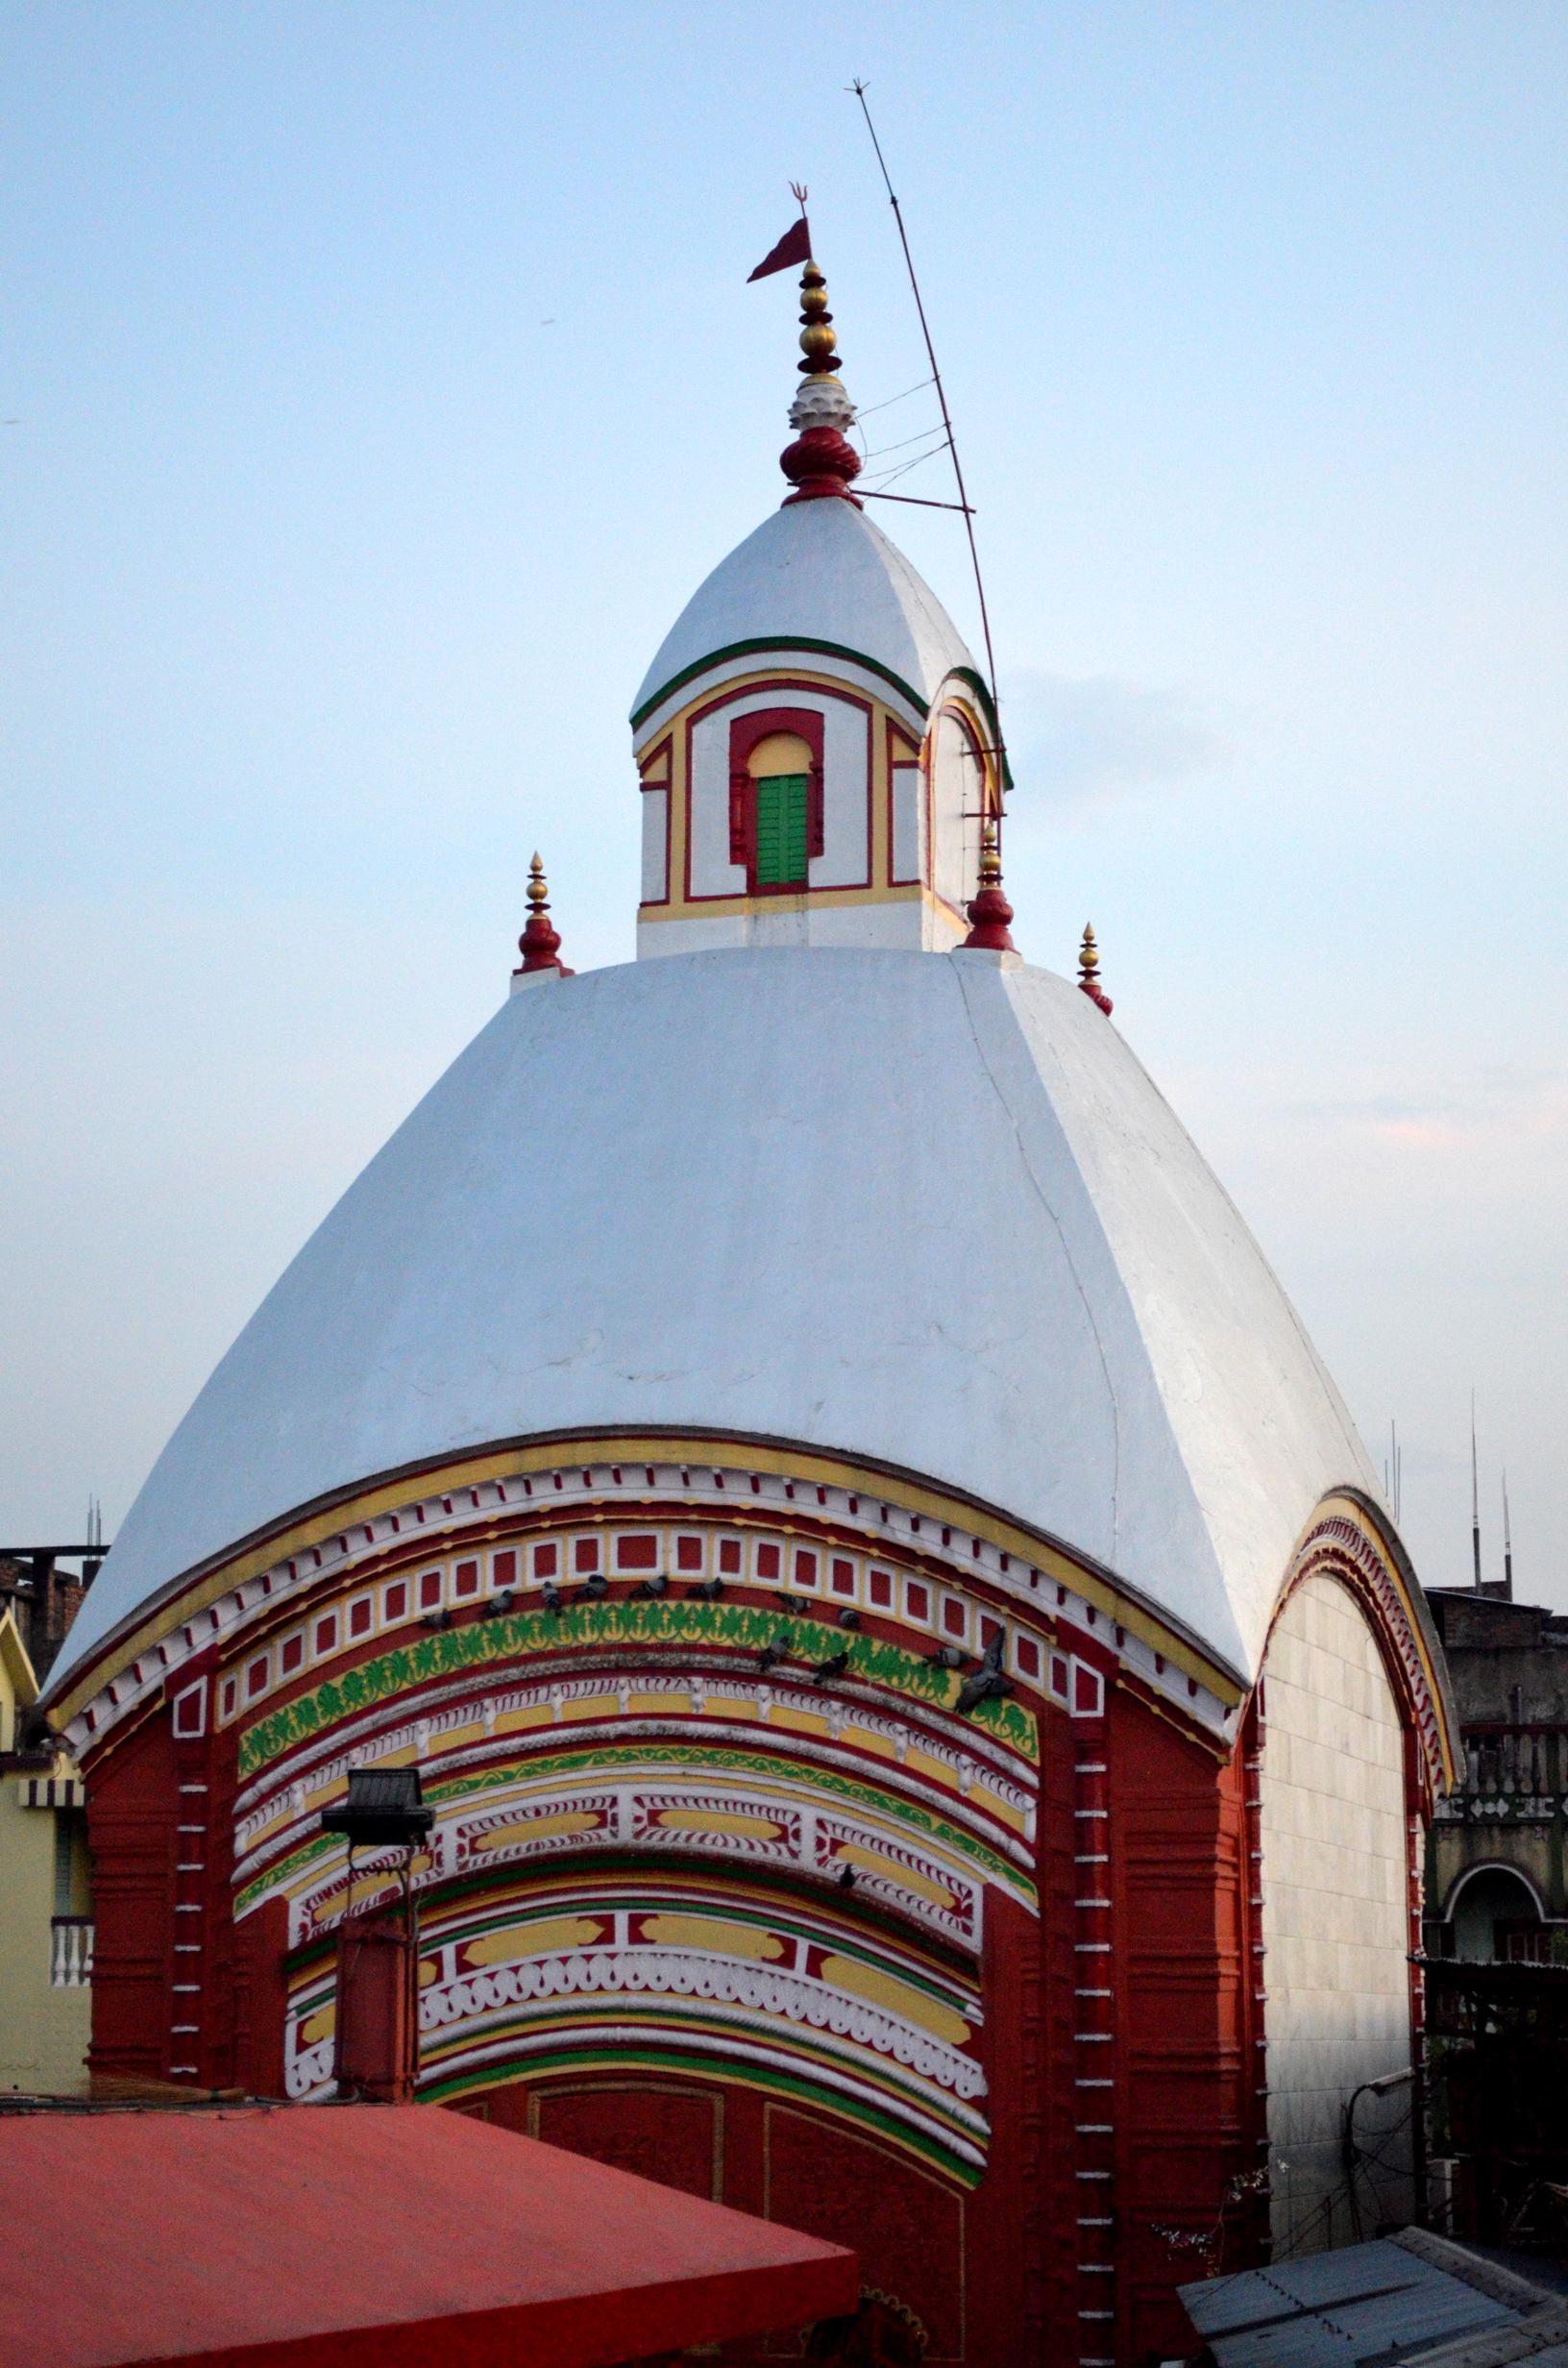 Tarapith Mandir